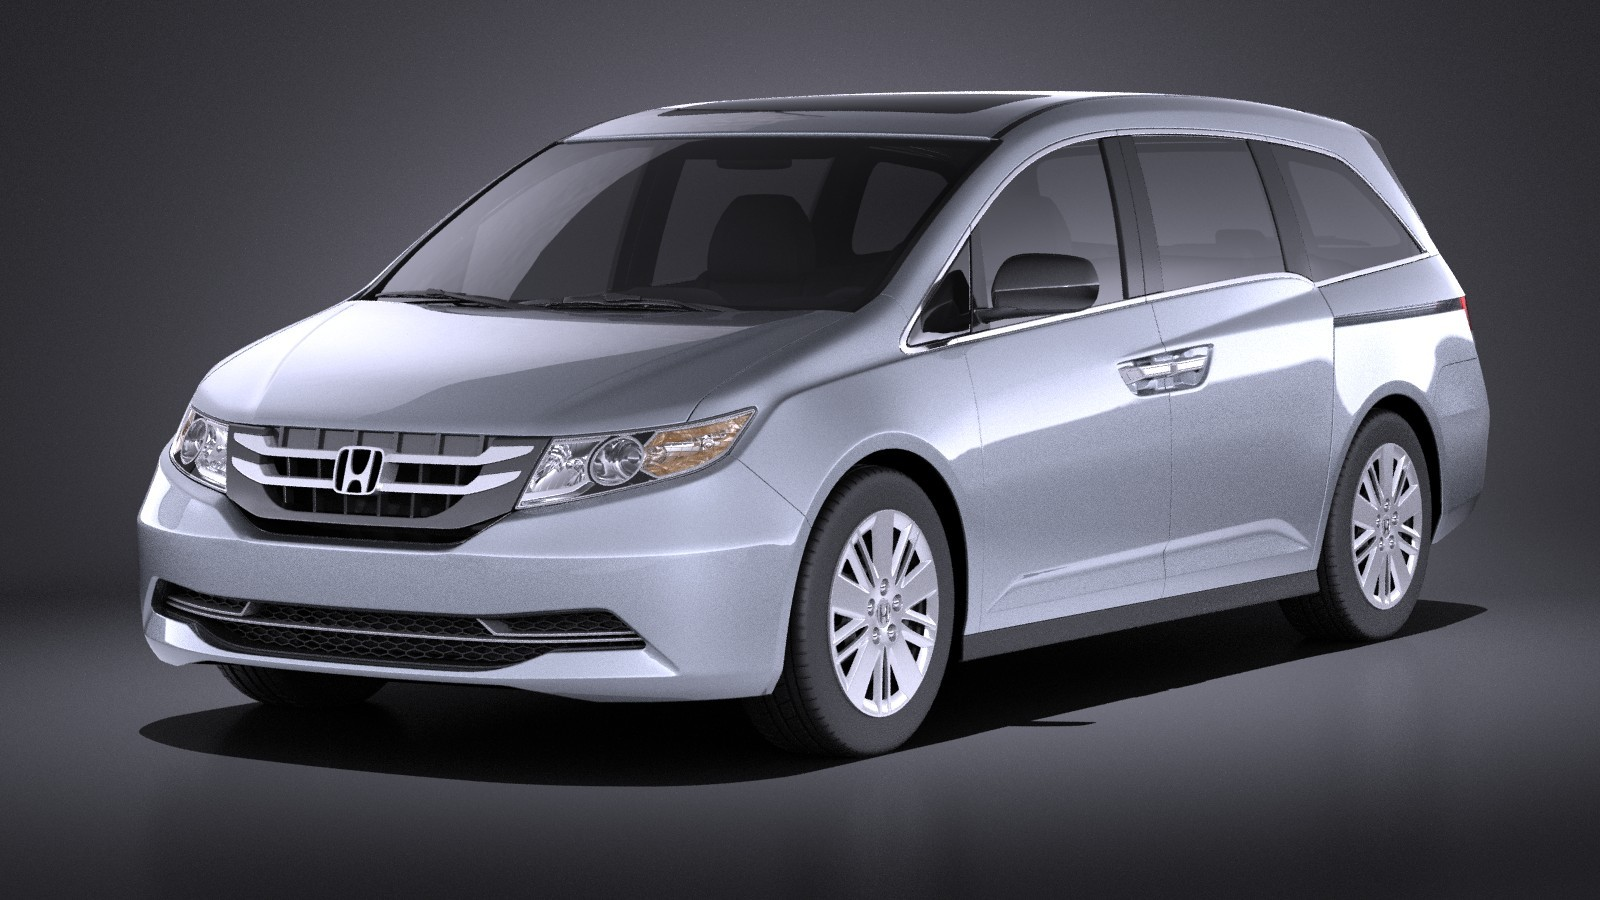 Honda Odyssey 2016 VRAY Sedan Car Vehicles 3D Models